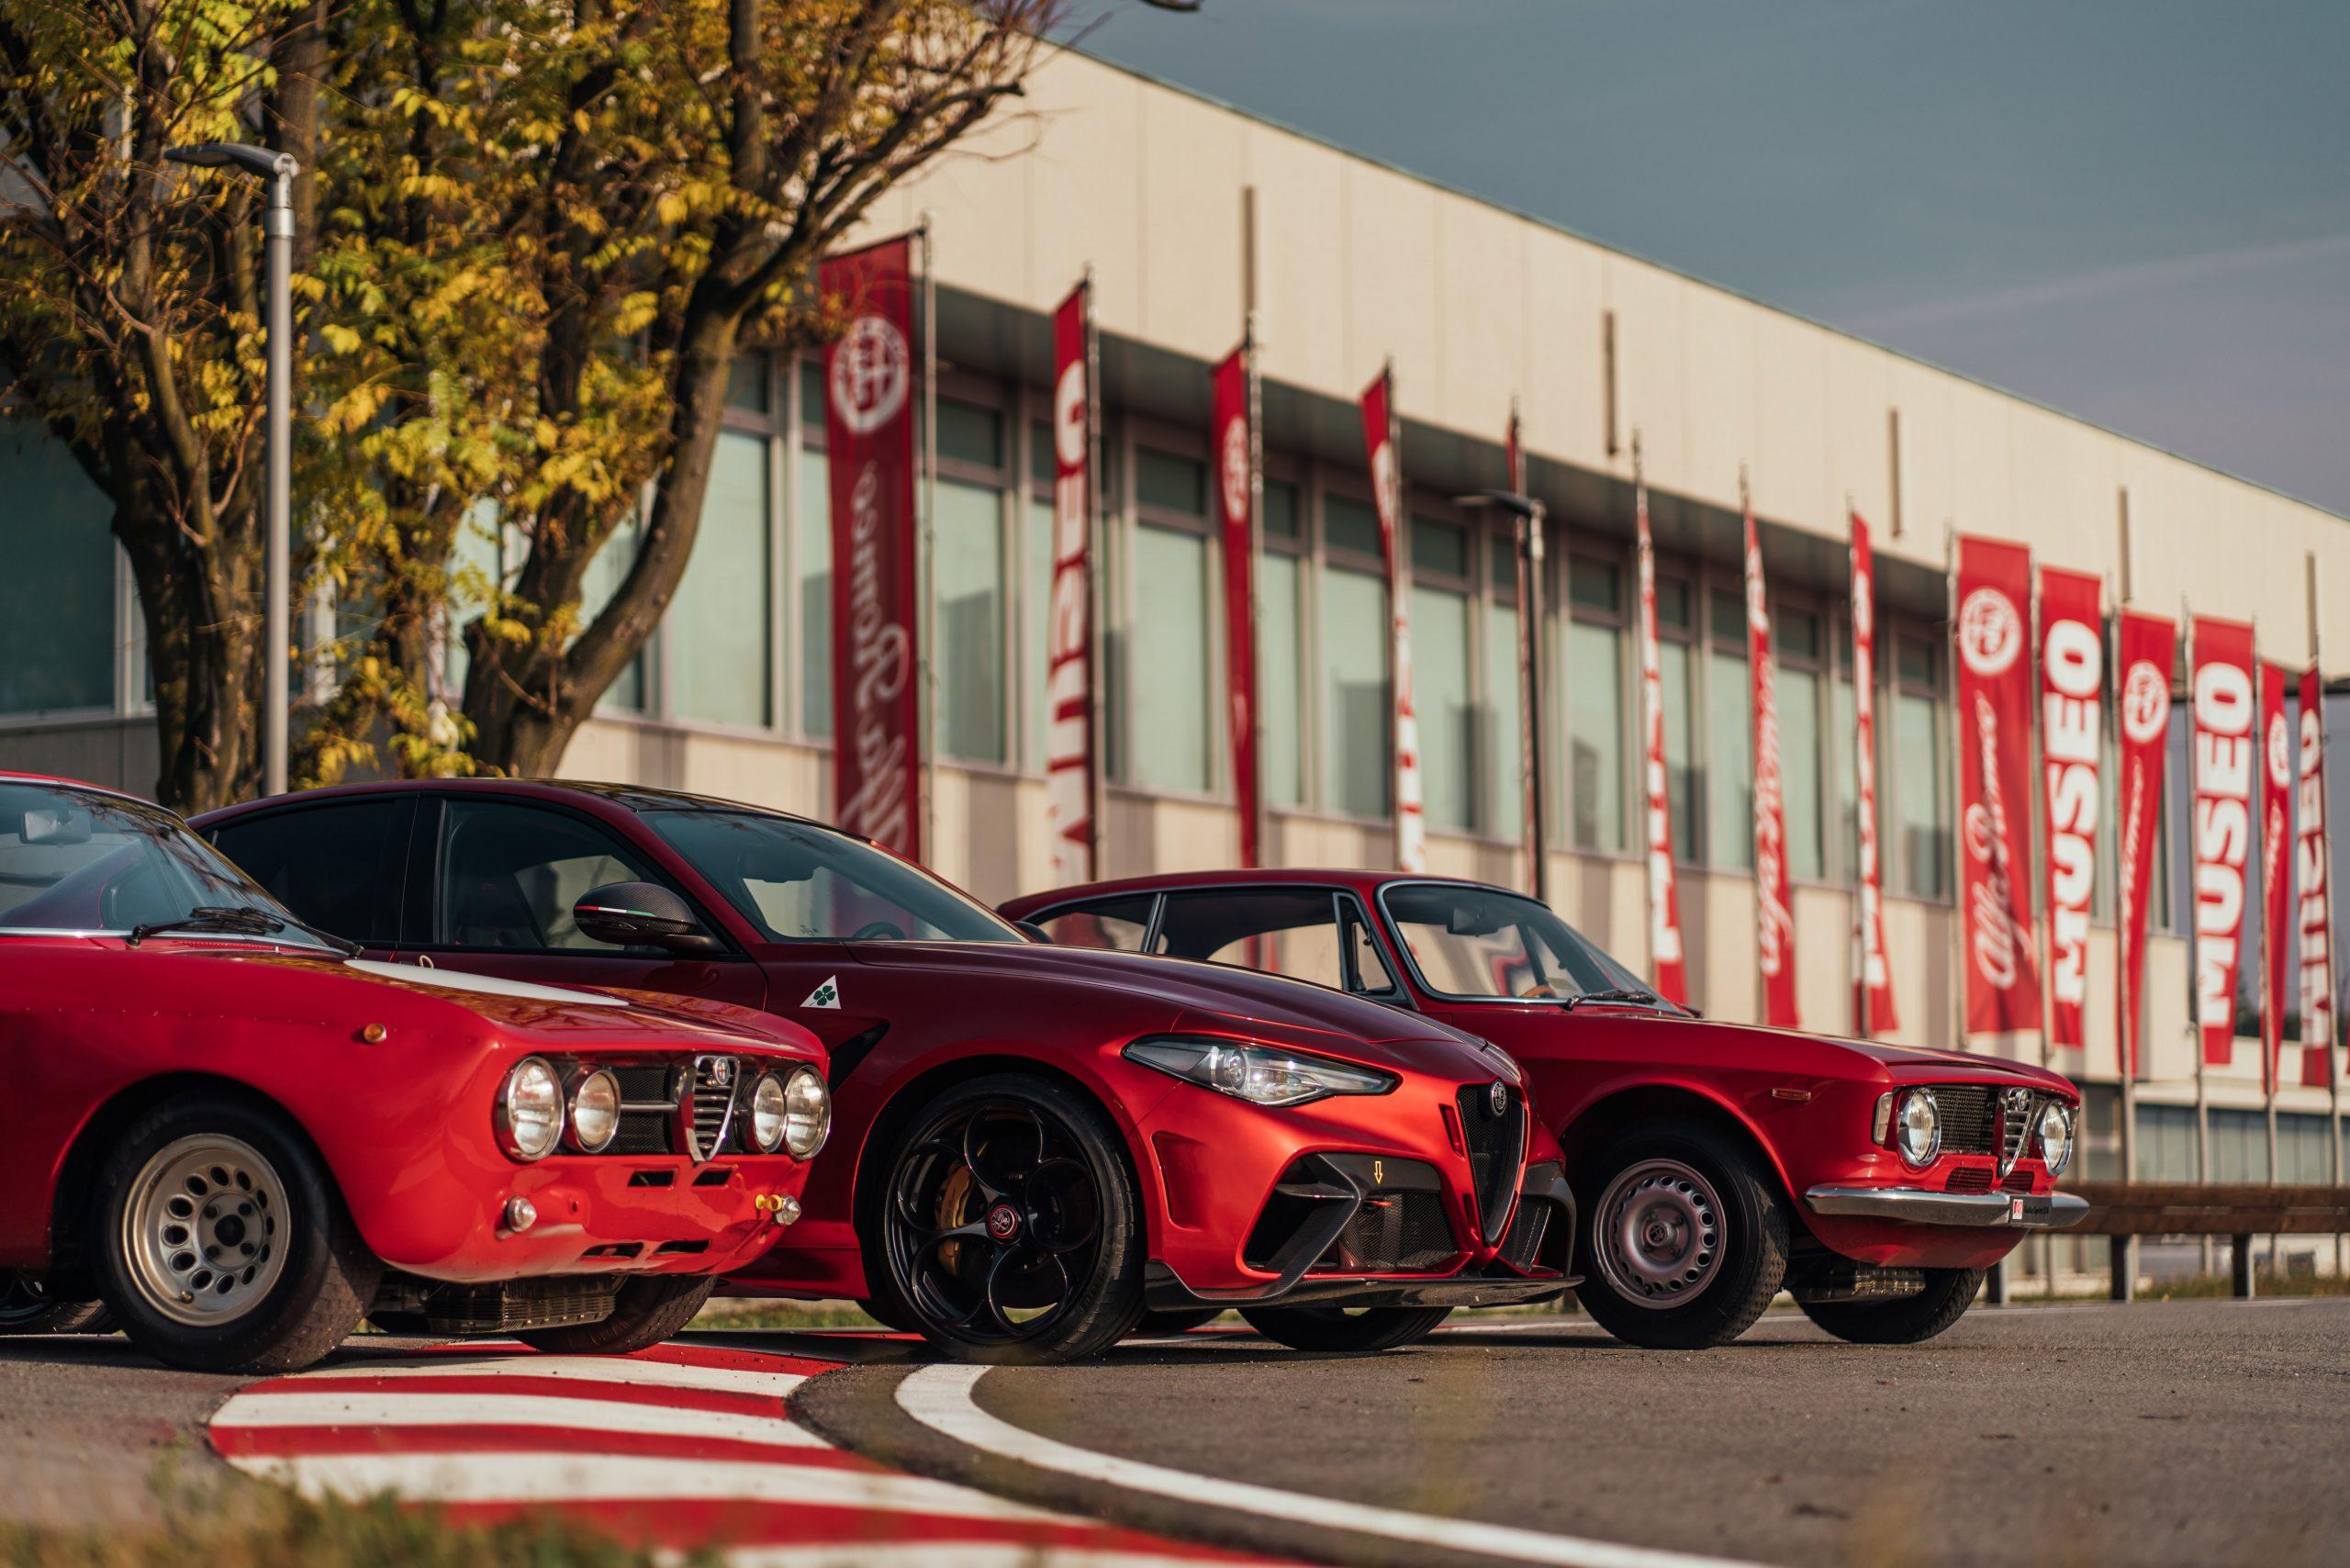 210610 AR 111 Anniversary 01 scaled H Alfa Romeo προσκαλεί τους Alfisti για τα 111α γενέθλια της Alfa, alfa romeo, Alfa Romeo Giulia, Alfa Romeo Giulia GTA, Alfa Romeo Giulia GTAm, ειδήσεις, Νέα